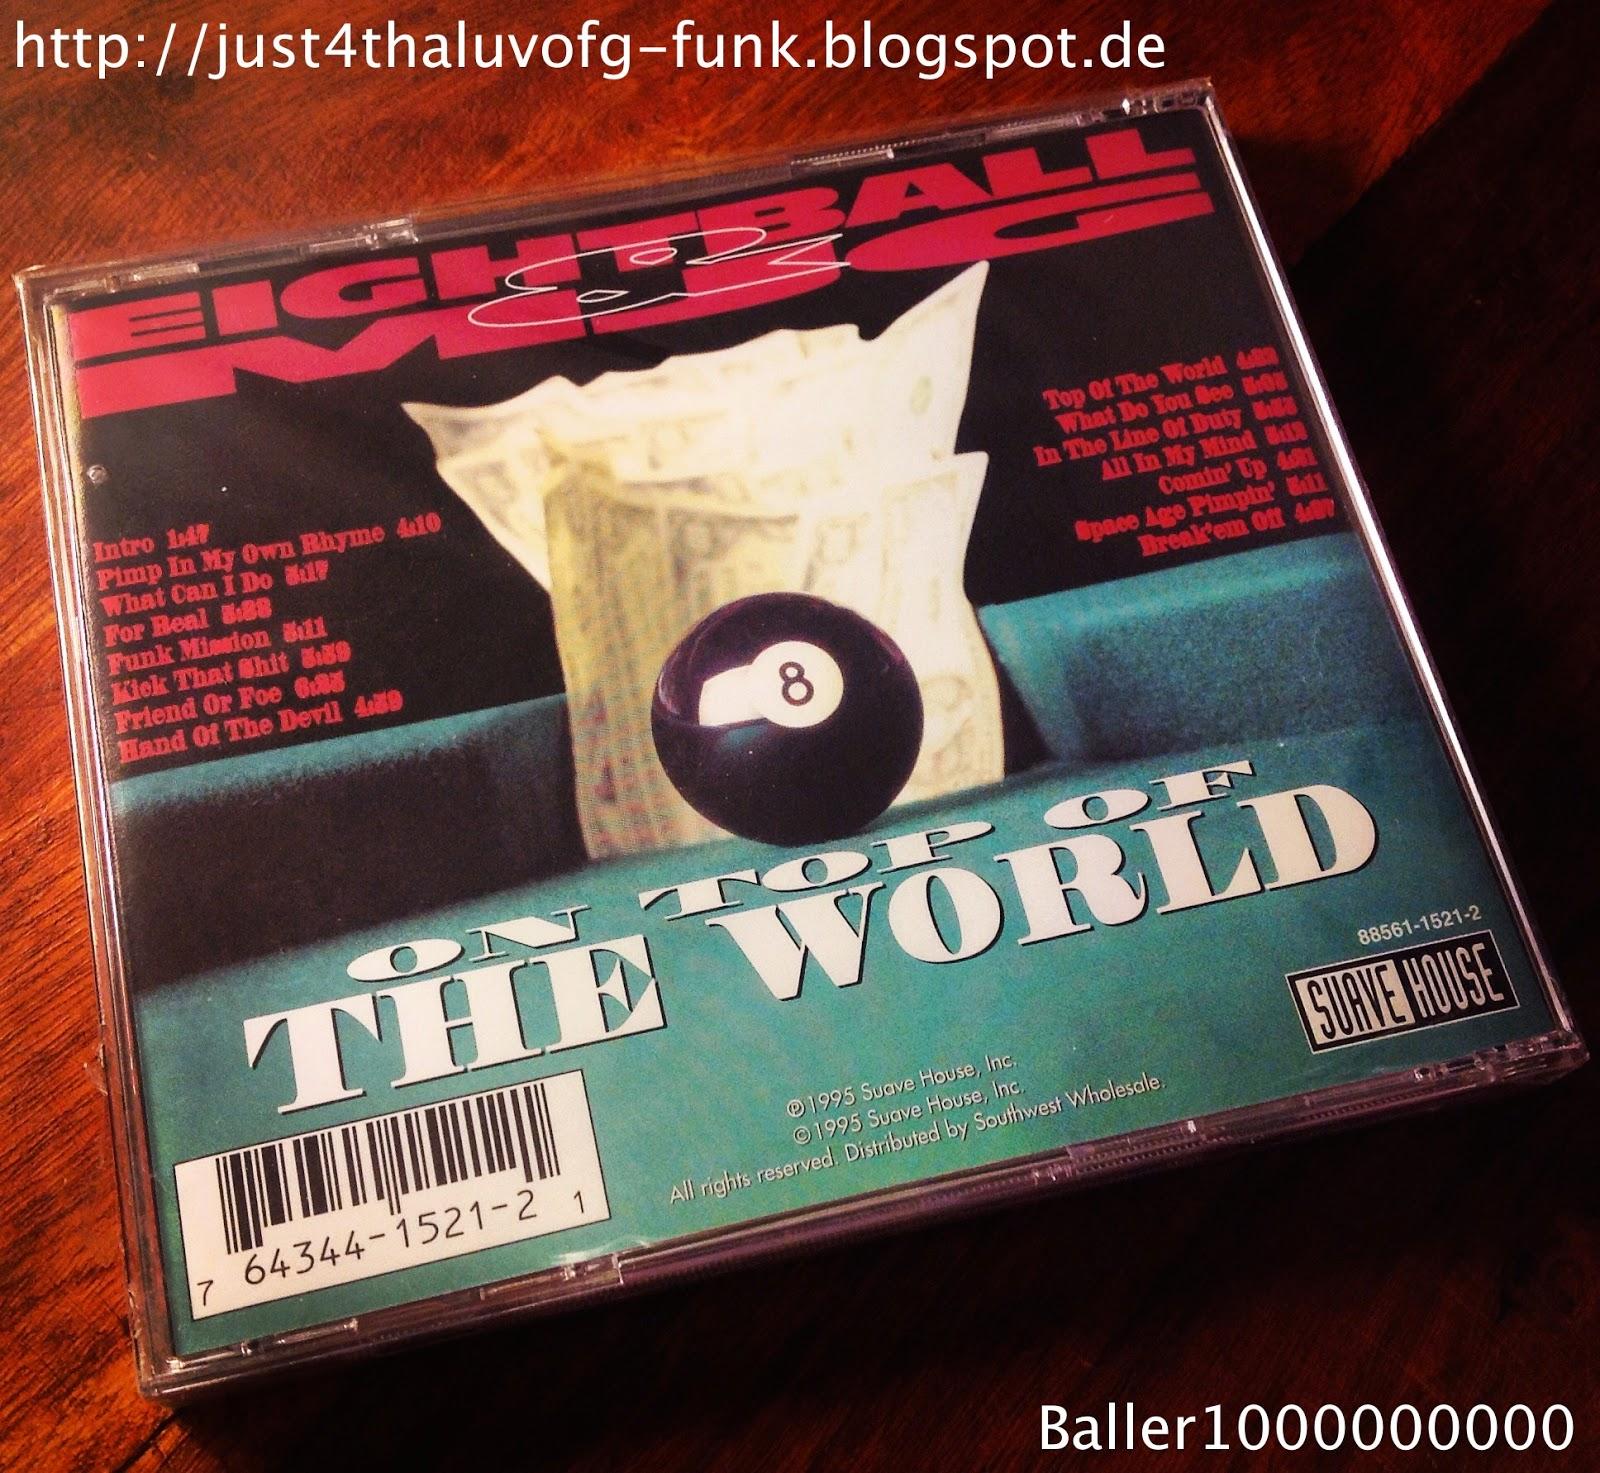 Eightball Mjg Discography Torrent